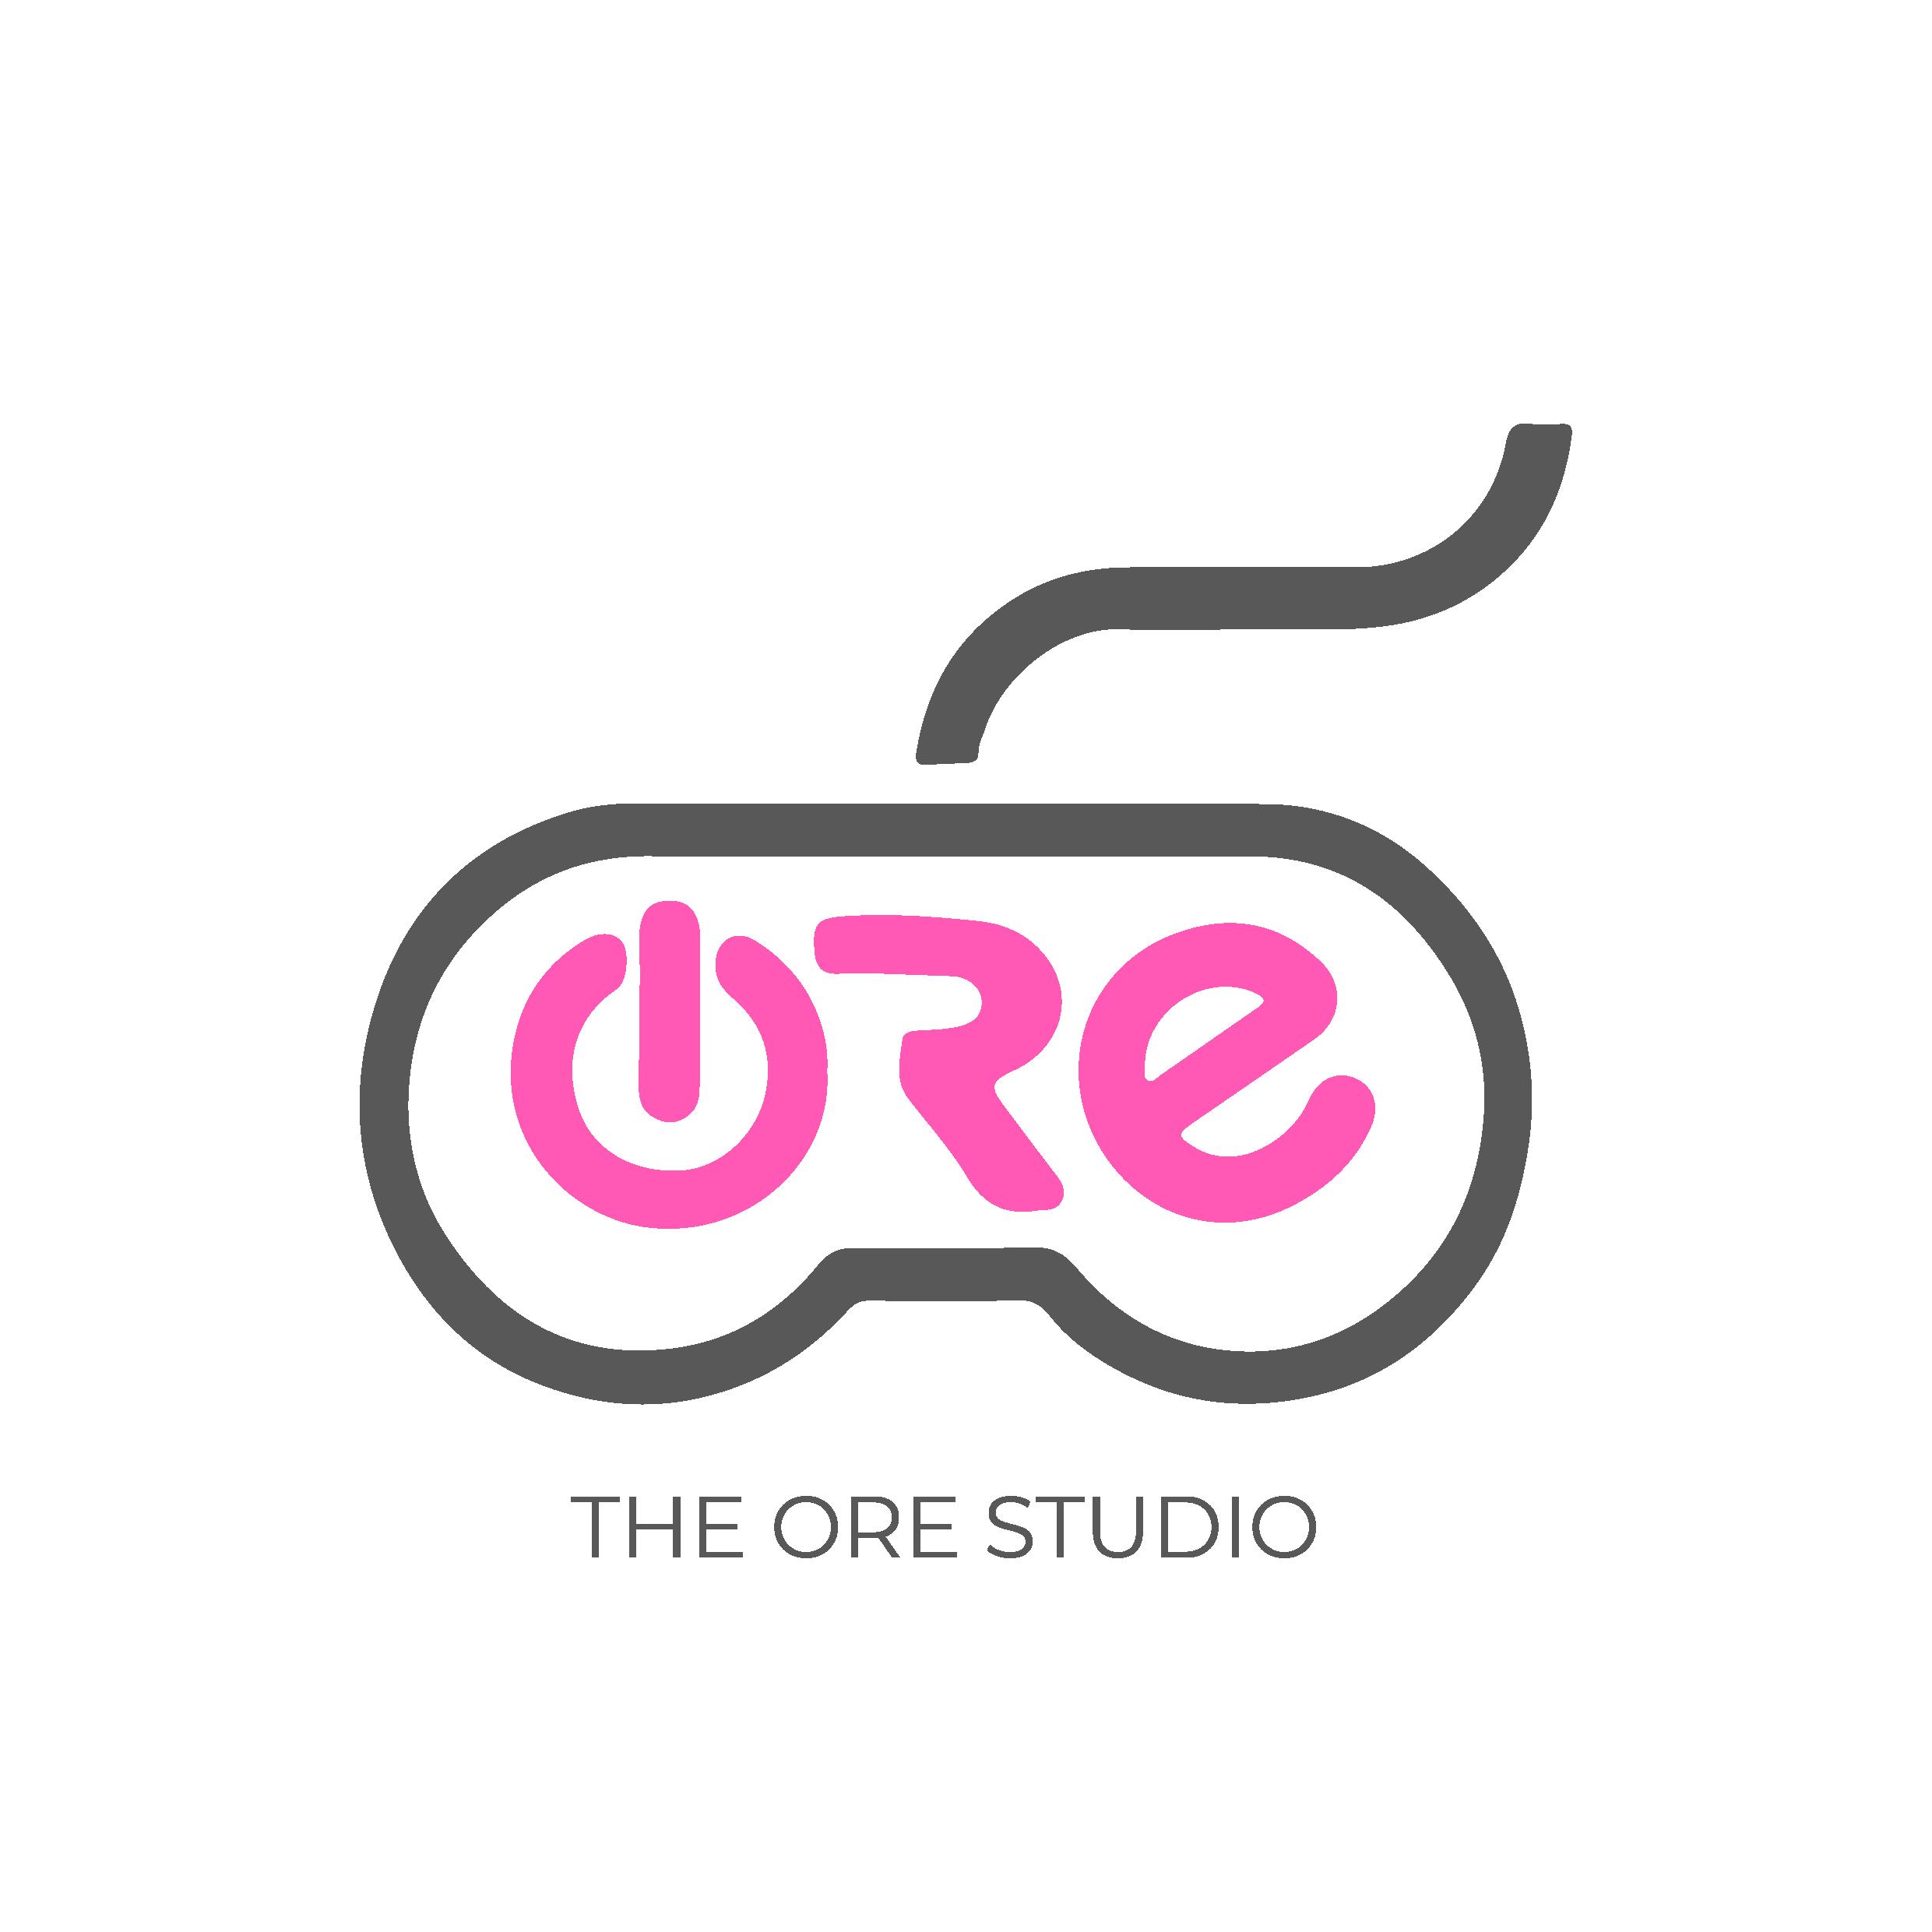 The Ore Studio Limited